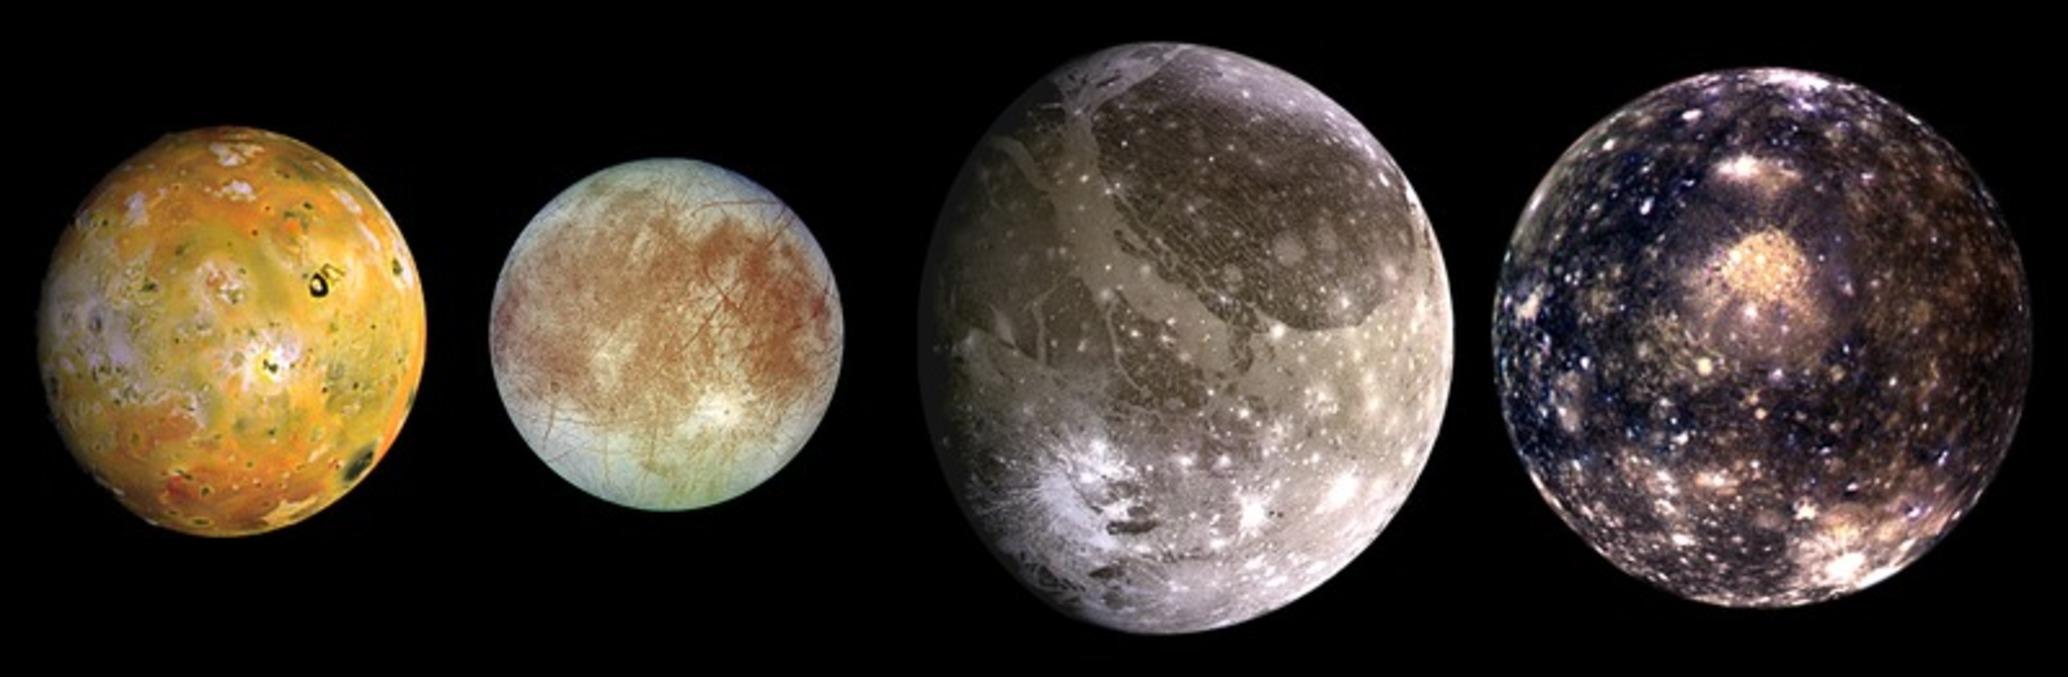 The Galilean moons of Jupiter: Io, Europa, Ganymede and Callisto. - Image Credit: NASA